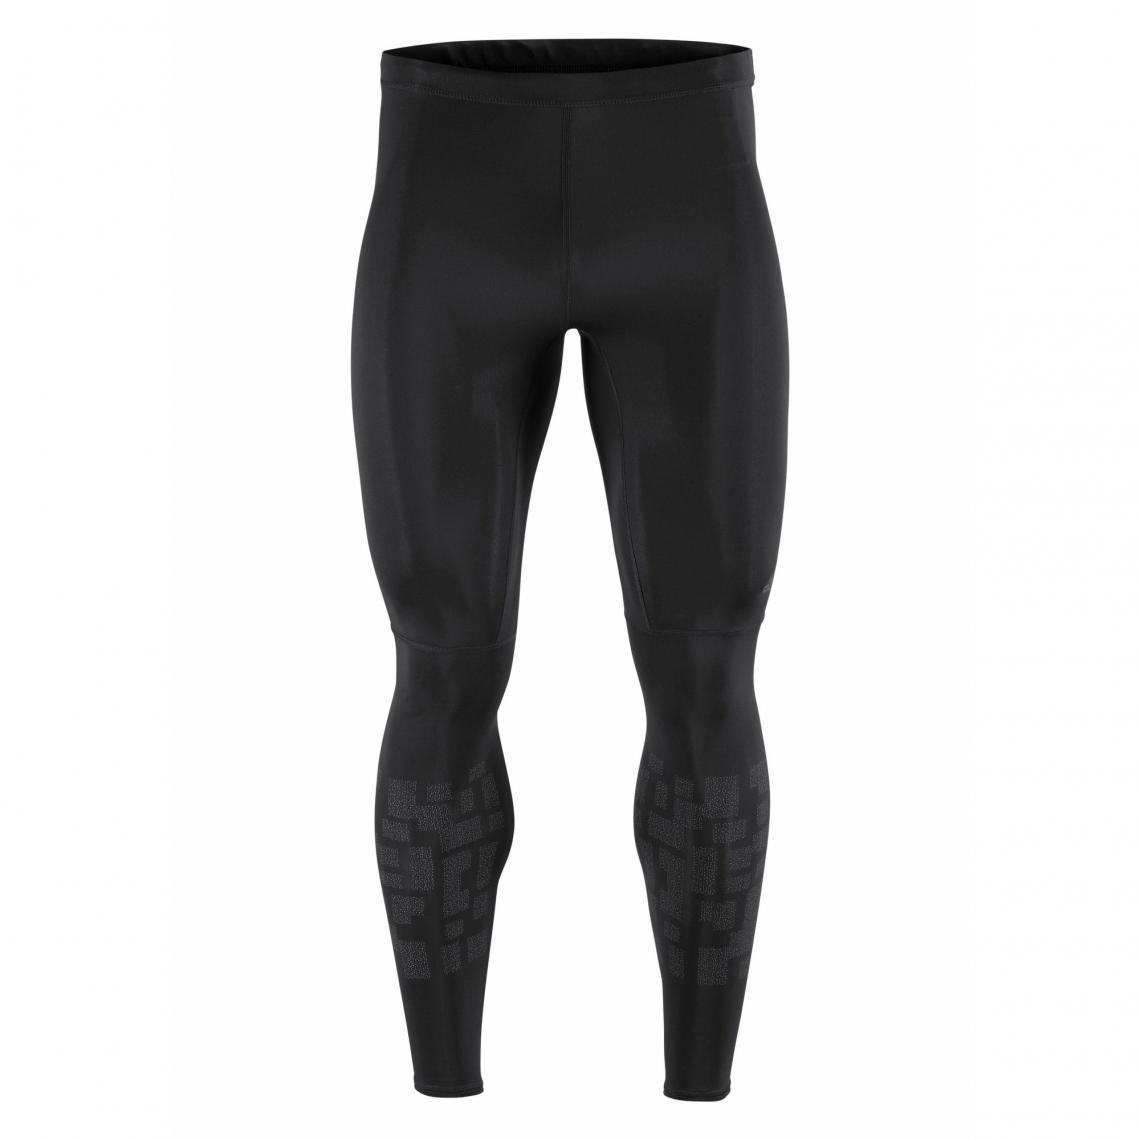 Homme Sport Long Men Zippée Supernova Tight De Poche Legging Adidas q35jcALR4S